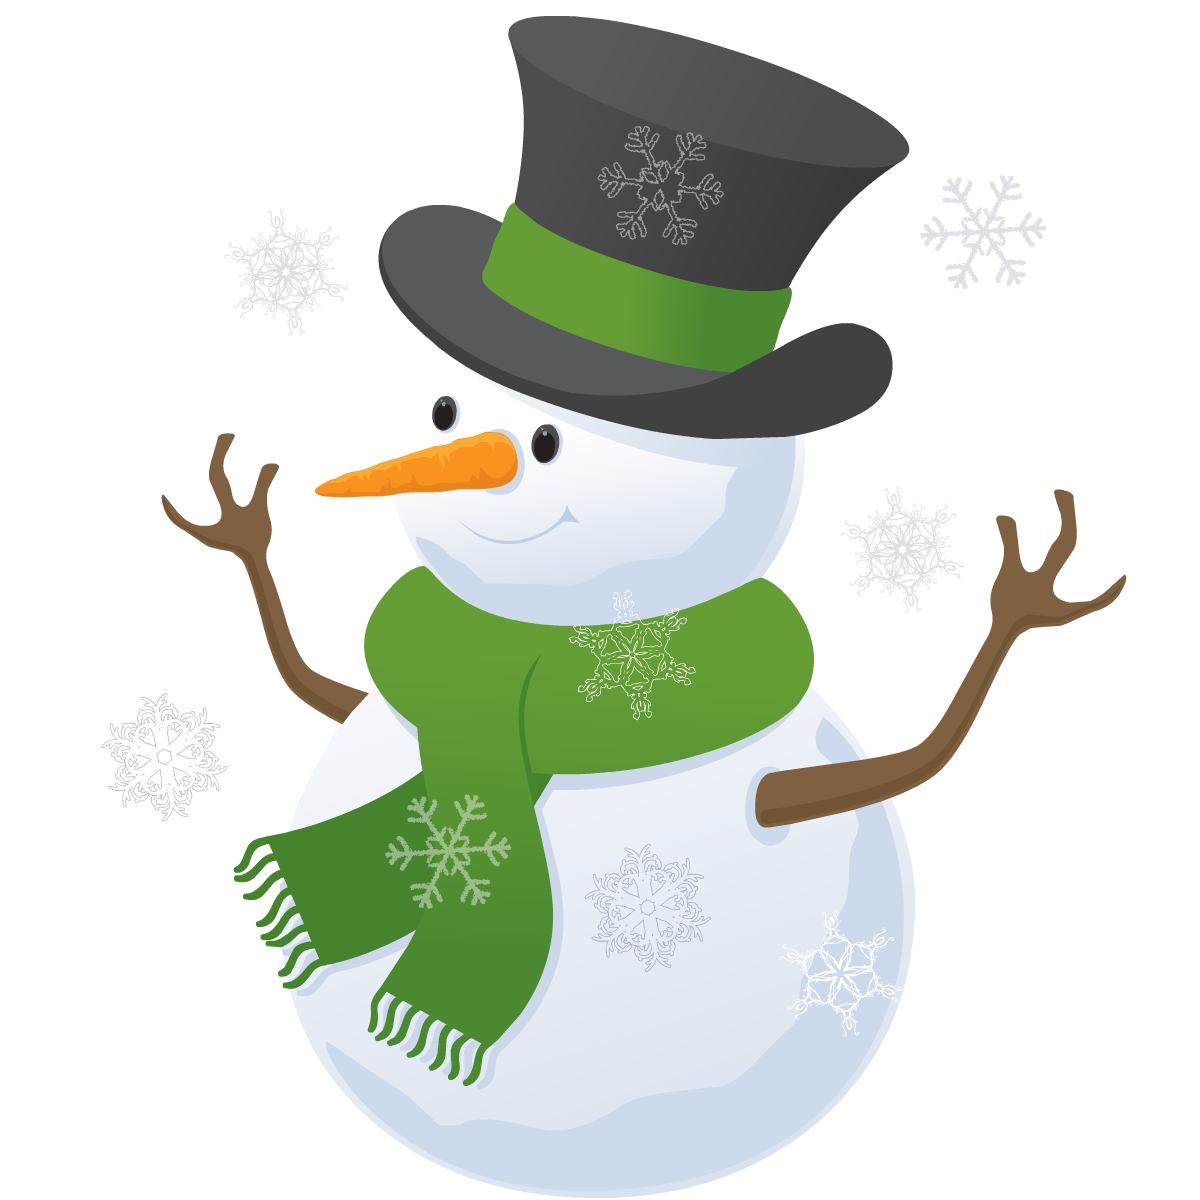 Miscellaneous Christmas images: Snowman